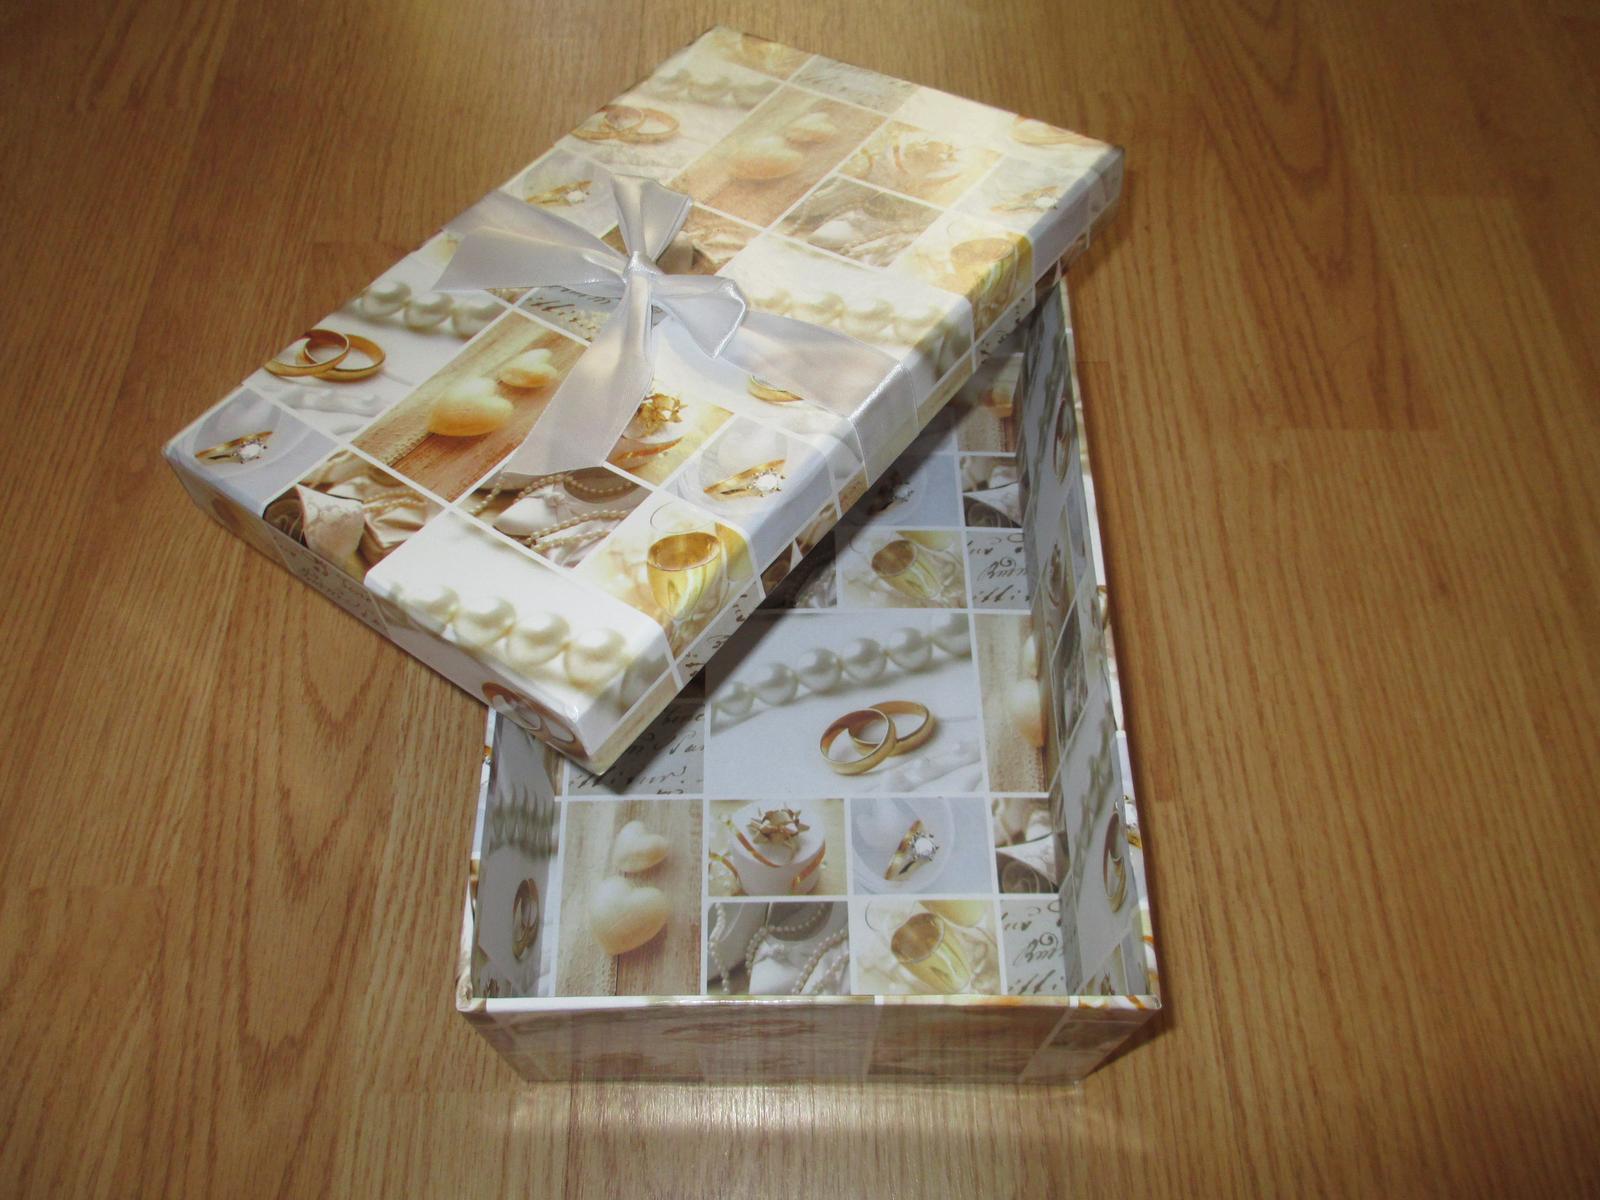 Svadobna krabica - Obrázok č. 3